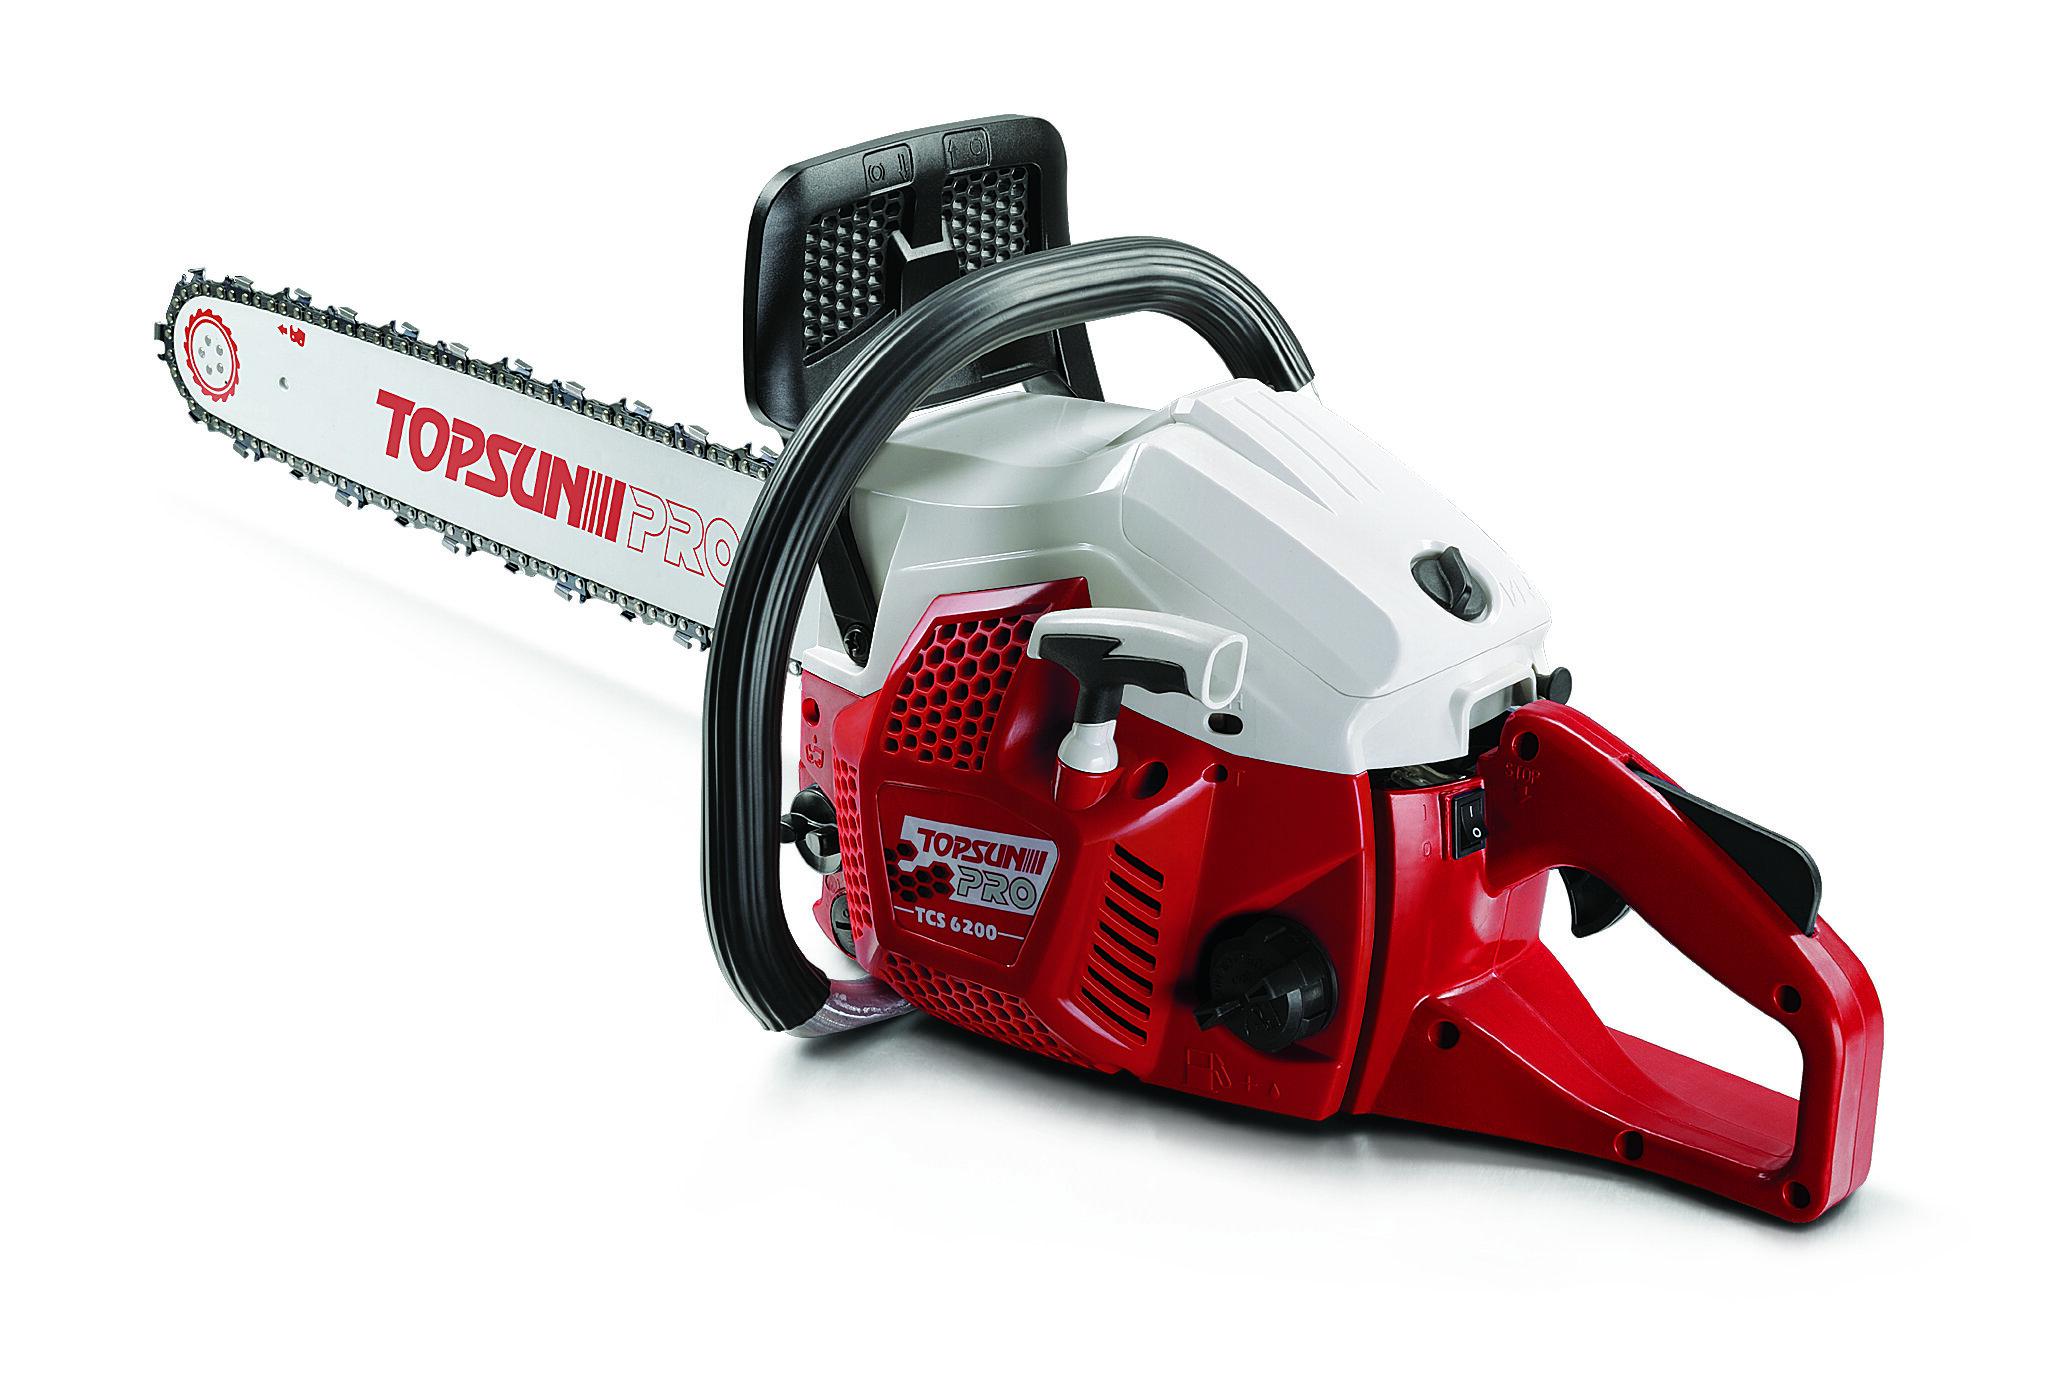 TOPSUN PRO Chainsaw TCS6200